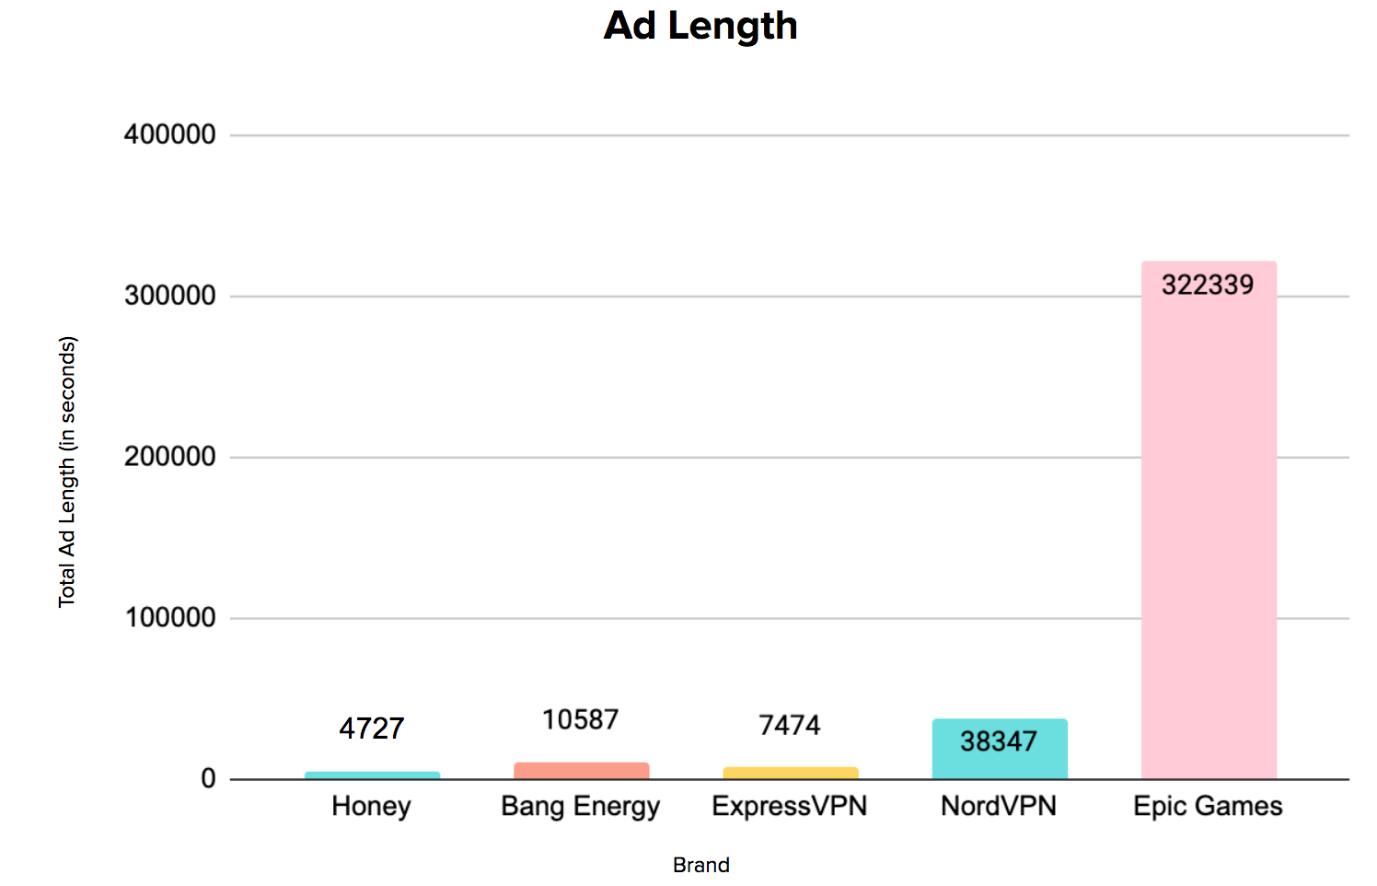 Top-Spending Brands Ad Length